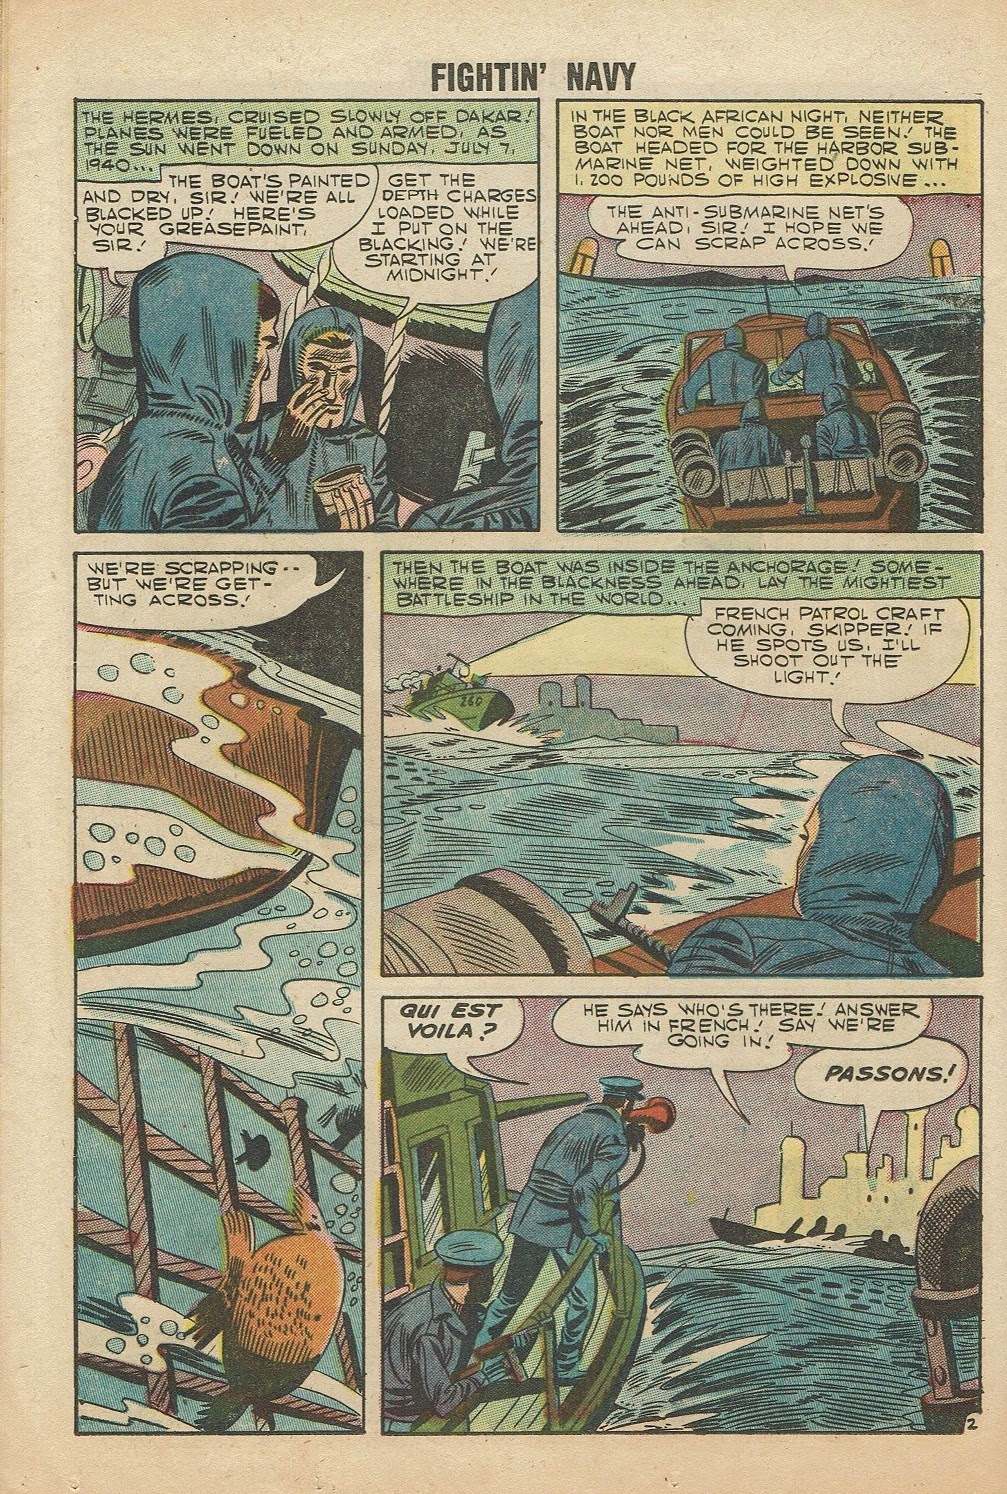 Read online Fightin' Navy comic -  Issue #81 - 24